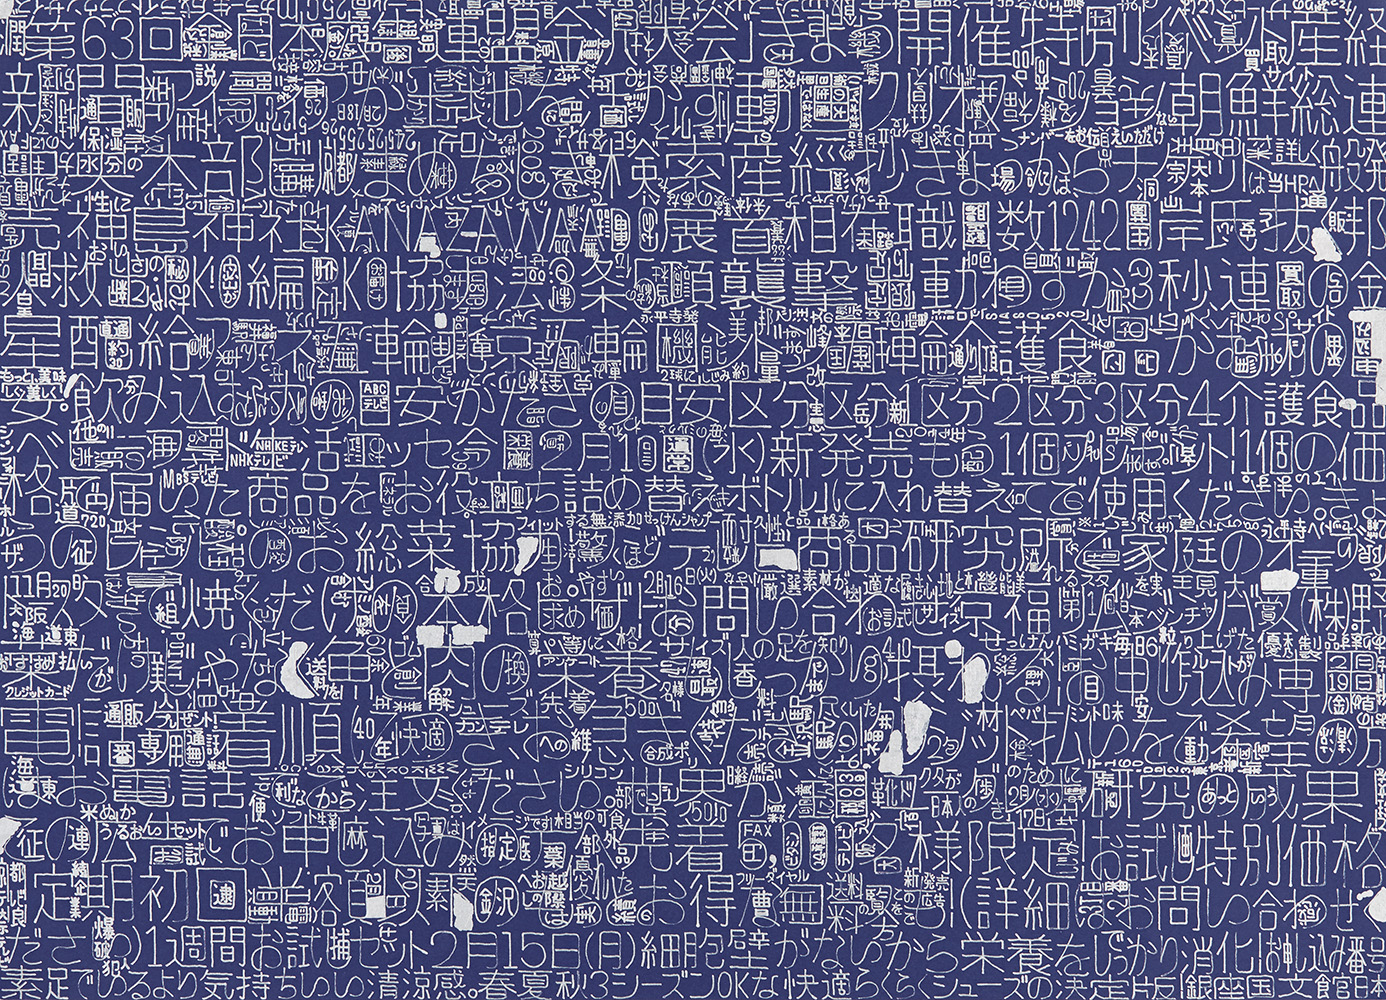 Yoshiyasu Hirano    Untitled  , 2015 Gel pen on paper 15.43 x 21.38 inches 39.2 x 54.3 cm YHi 5